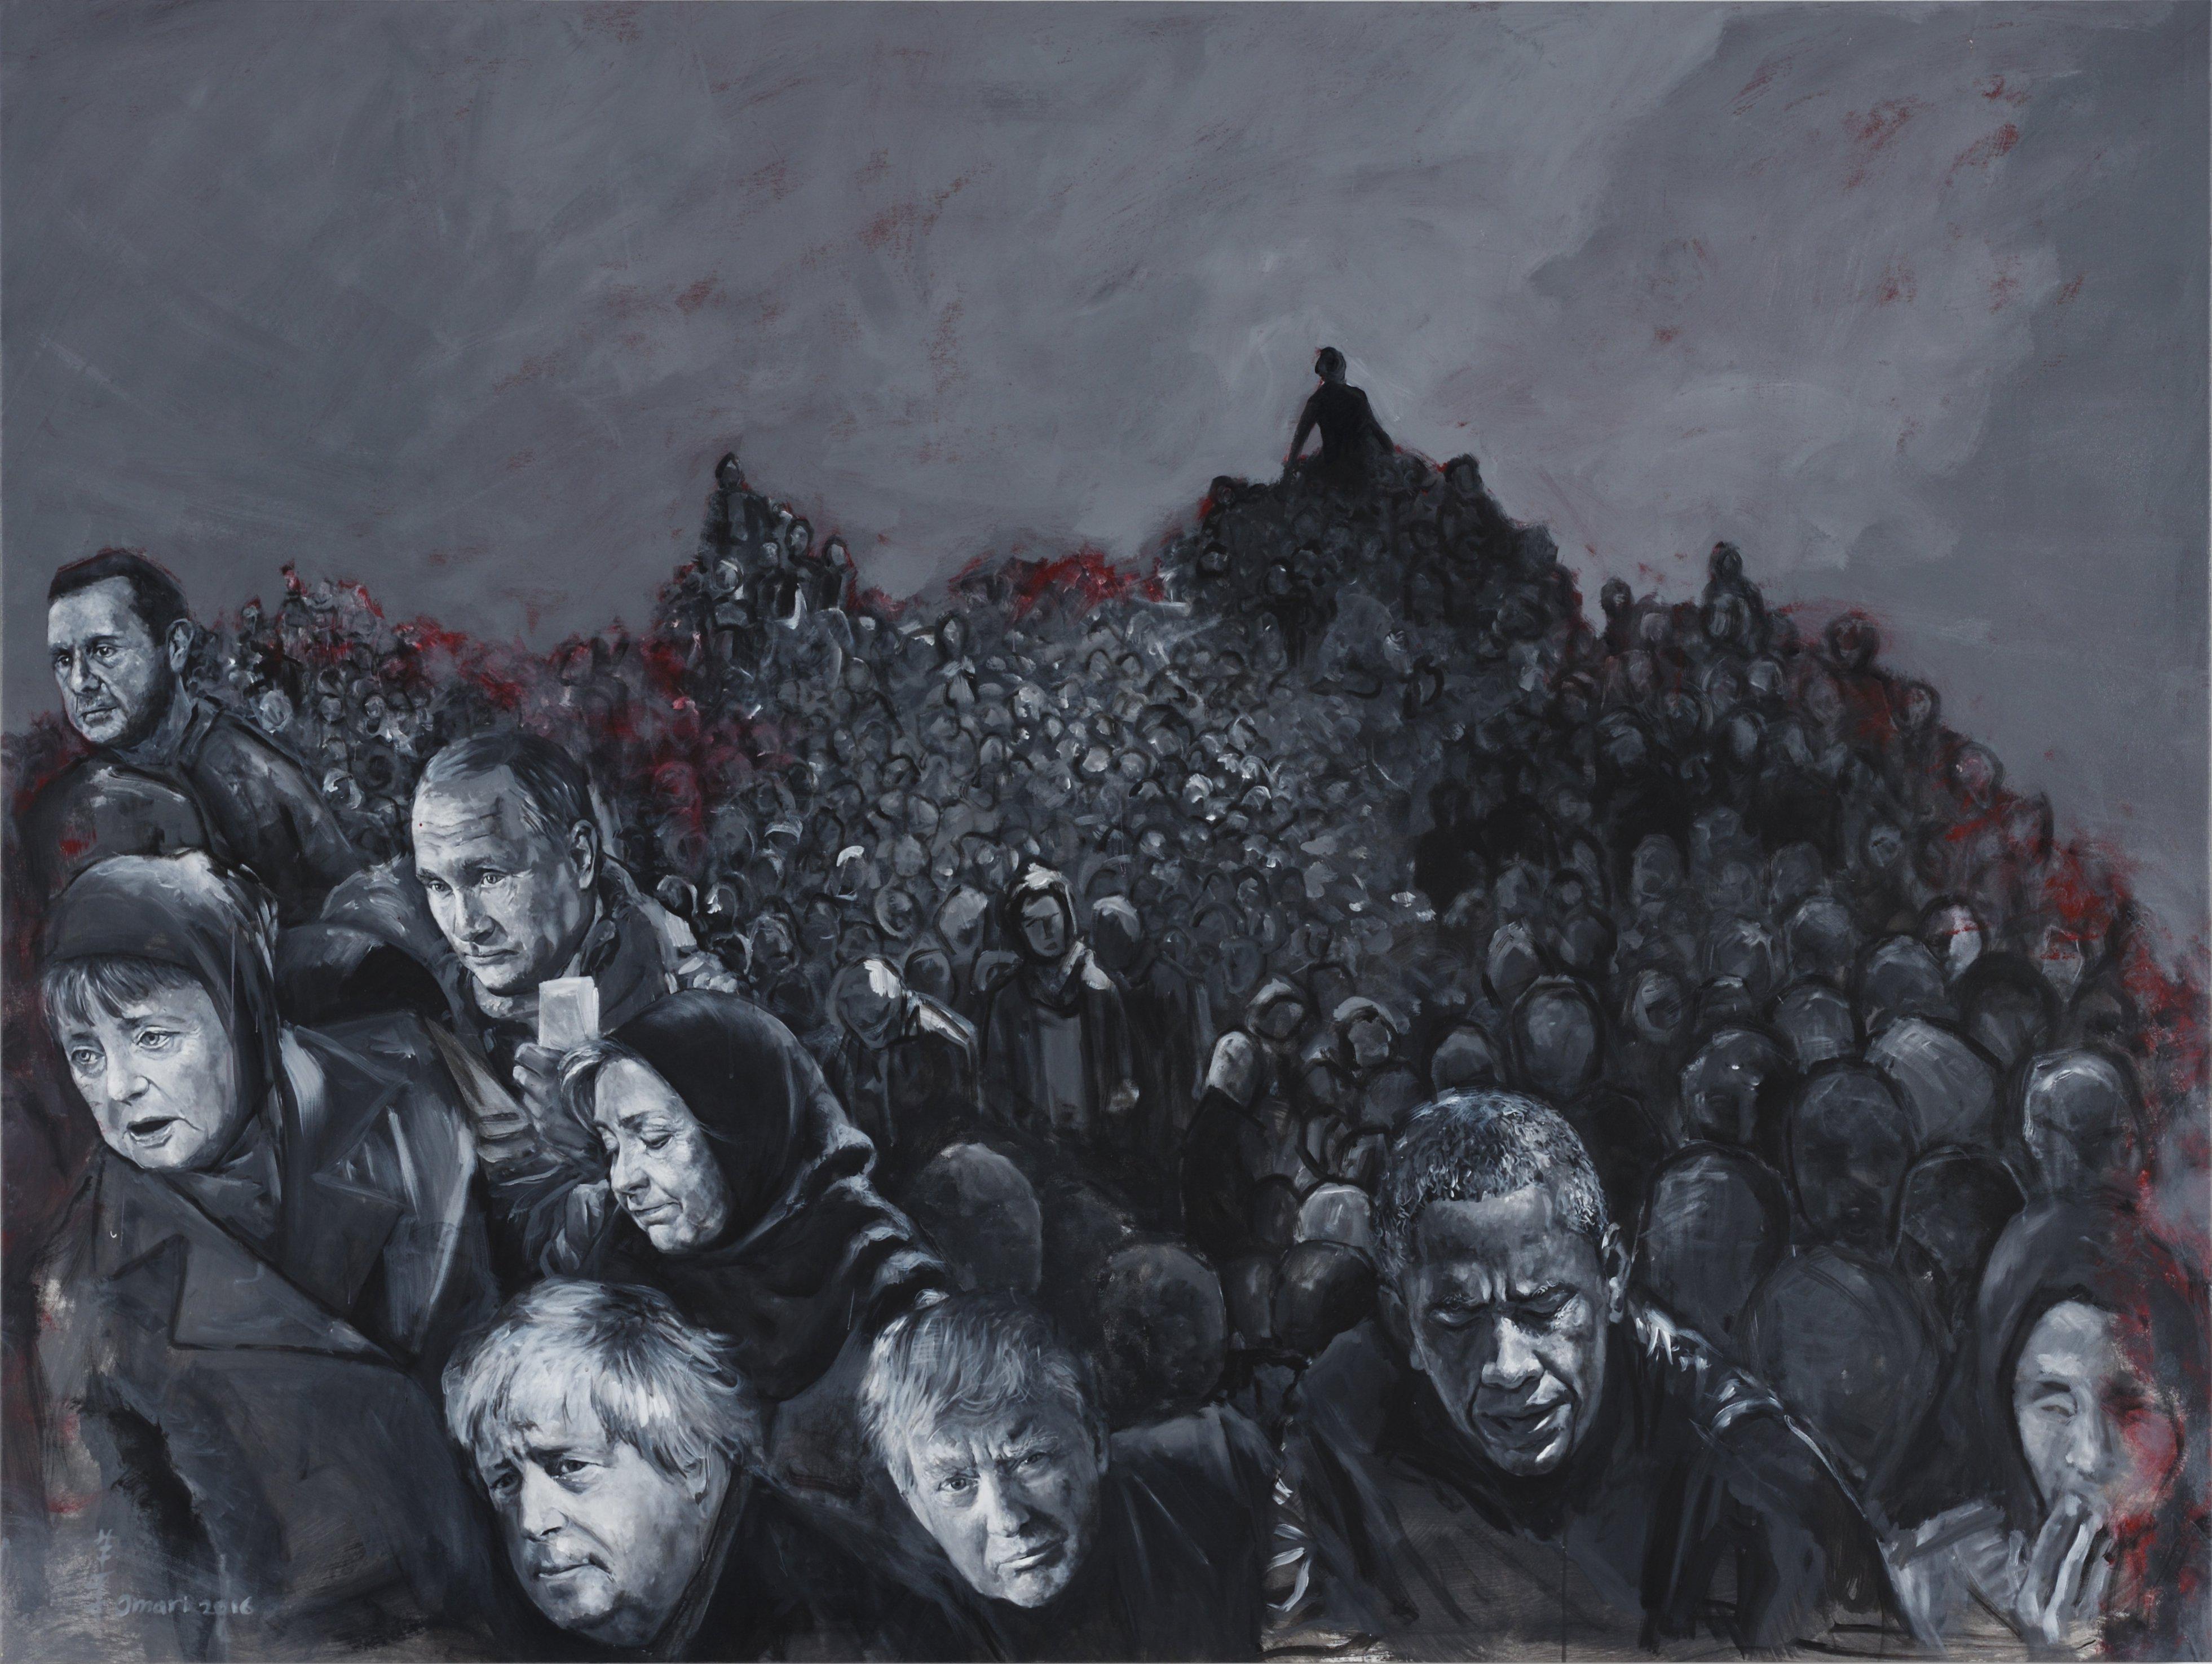 AO19 Abdalla Al Omari 'Yarmouk' 143 x 190 cm Acrylic on canvas 2016.jpg